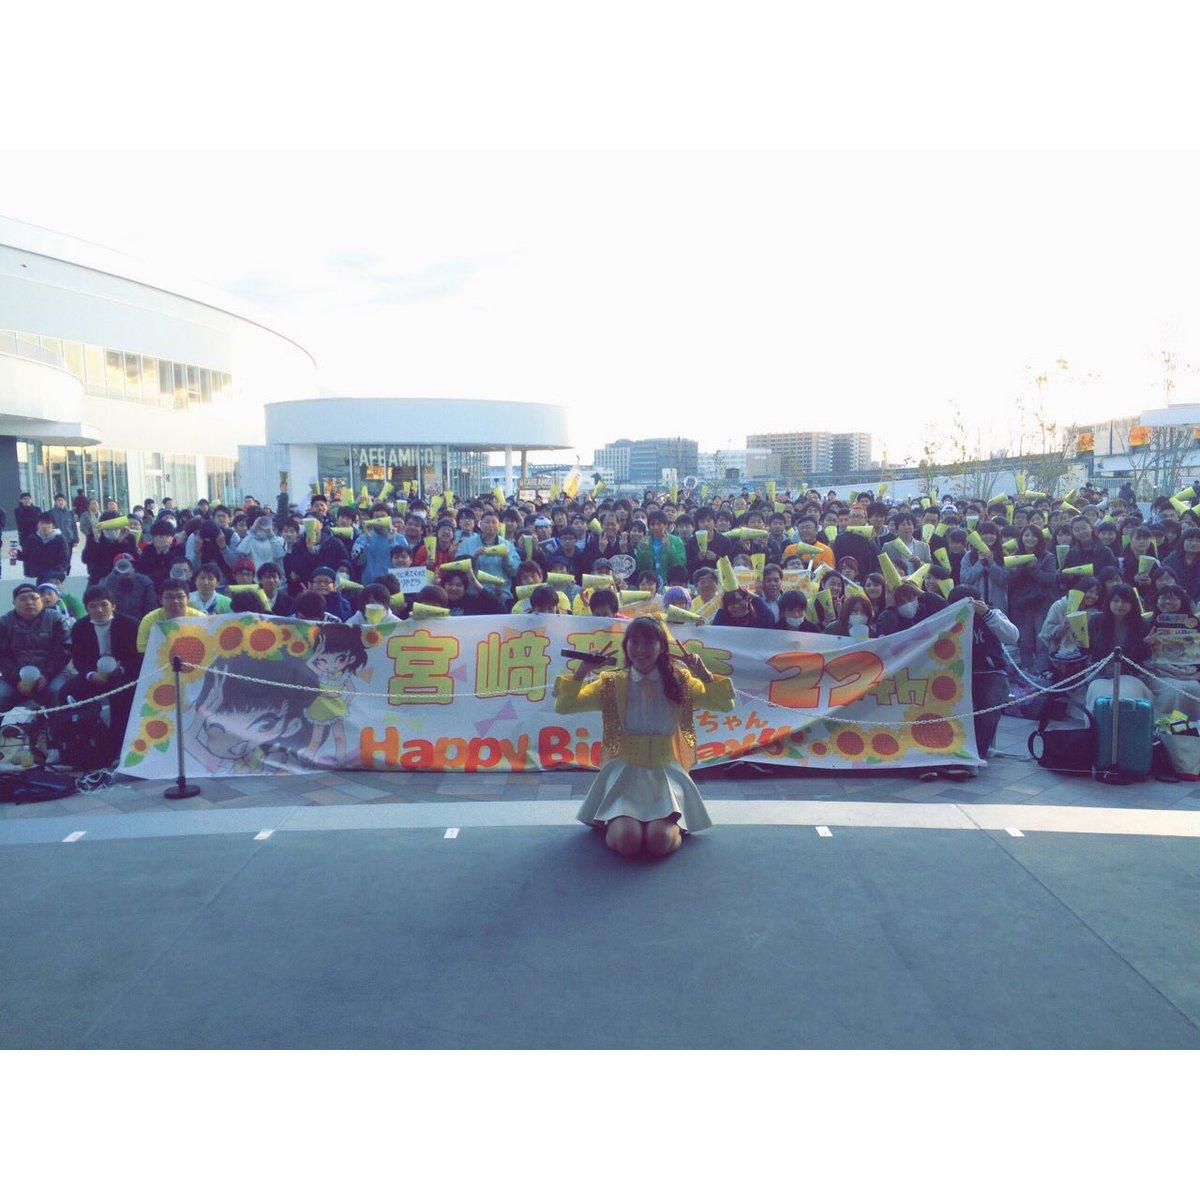 TIF2015 Tokyo Idol Festival 2015 反省会 day111 [無断転載禁止]©2ch.netYouTube動画>14本 dailymotion>1本 ->画像>637枚